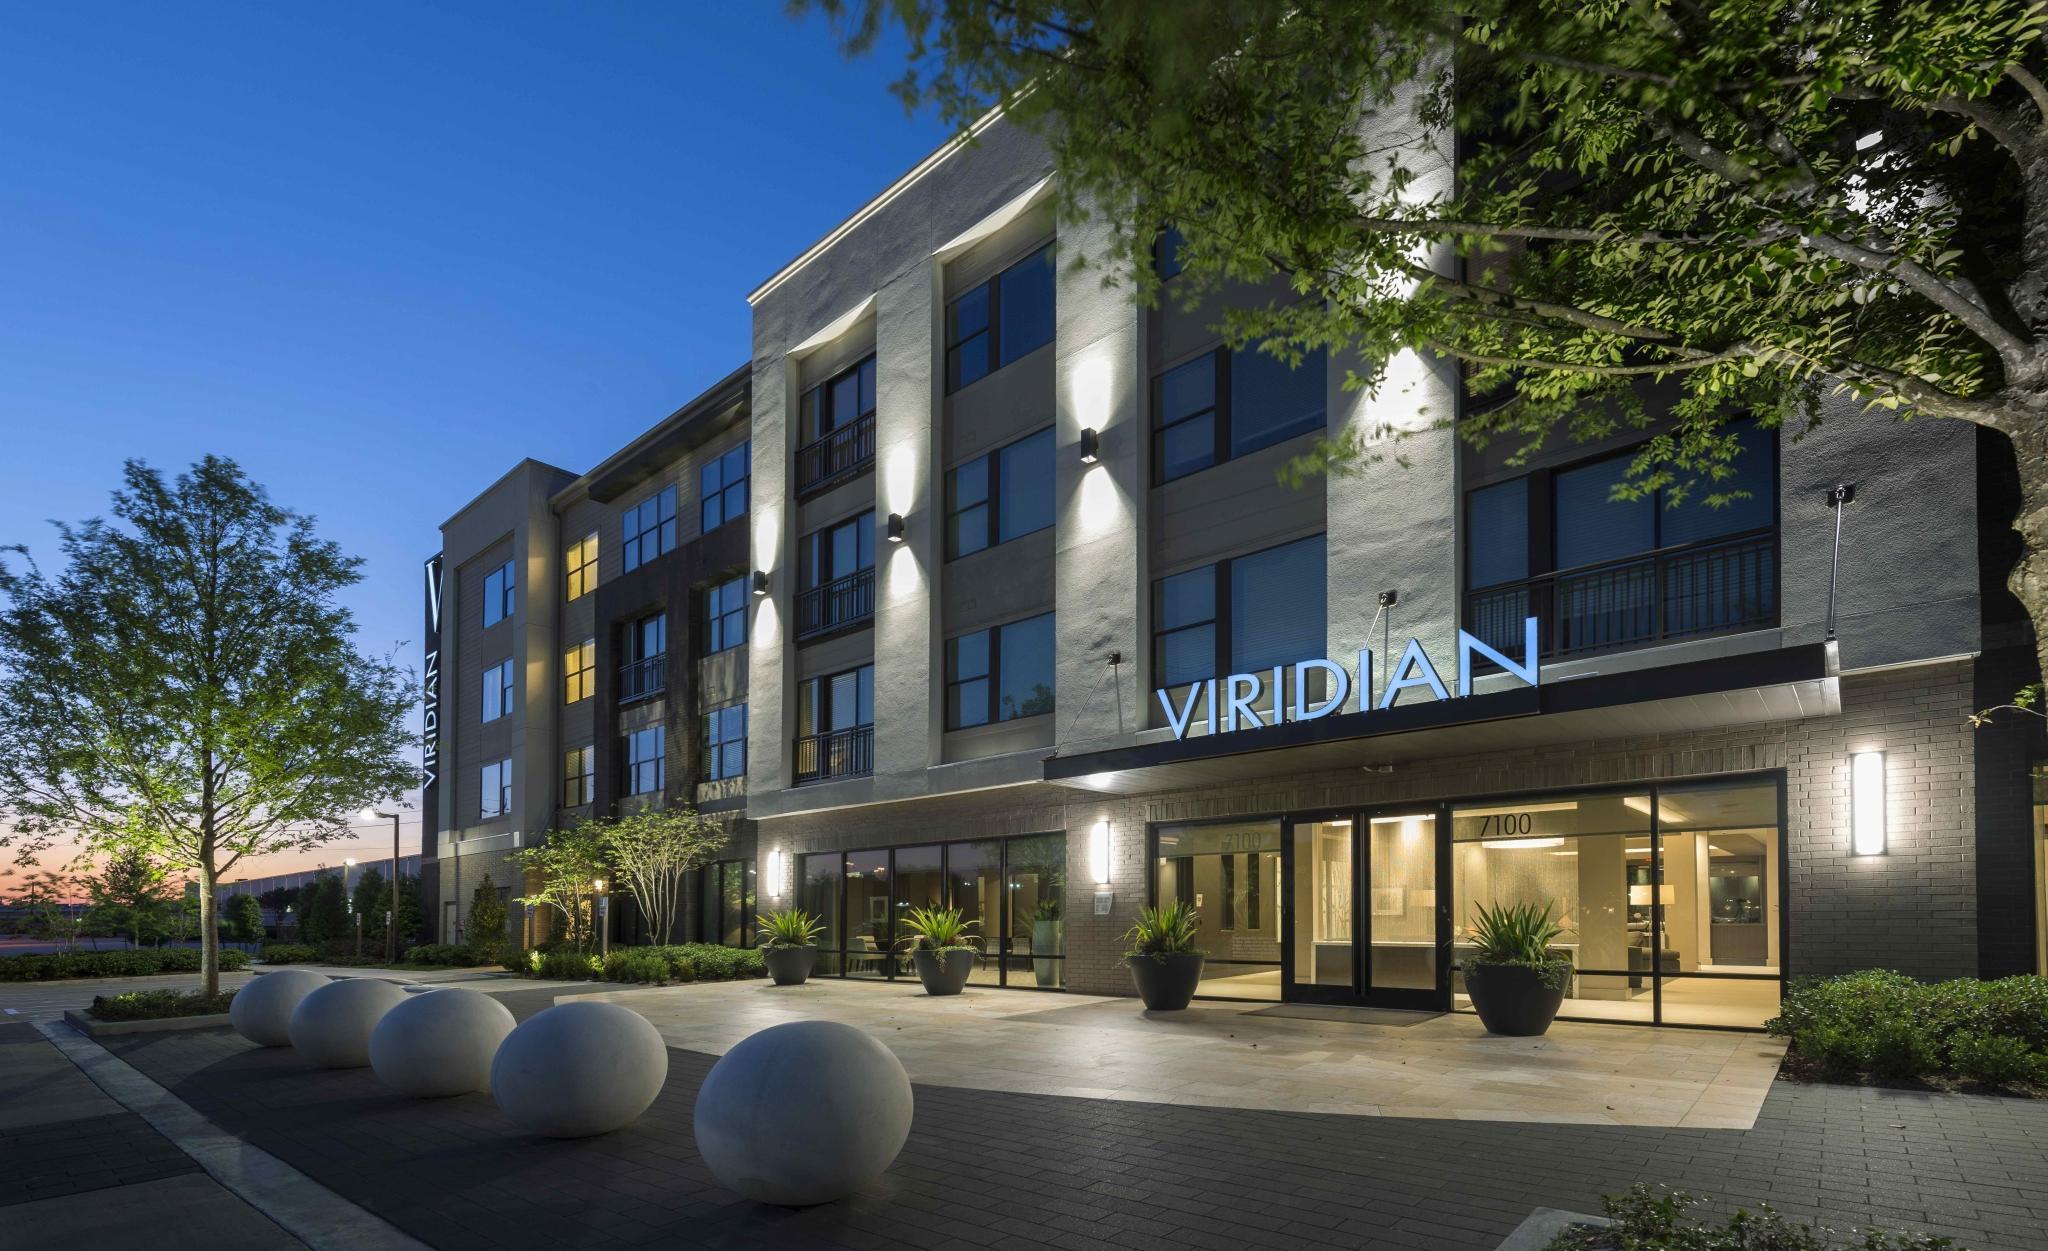 Apartments Near Strayer University-Northwest Houston Viridian Design District for Strayer University-Northwest Houston Students in Houston, TX